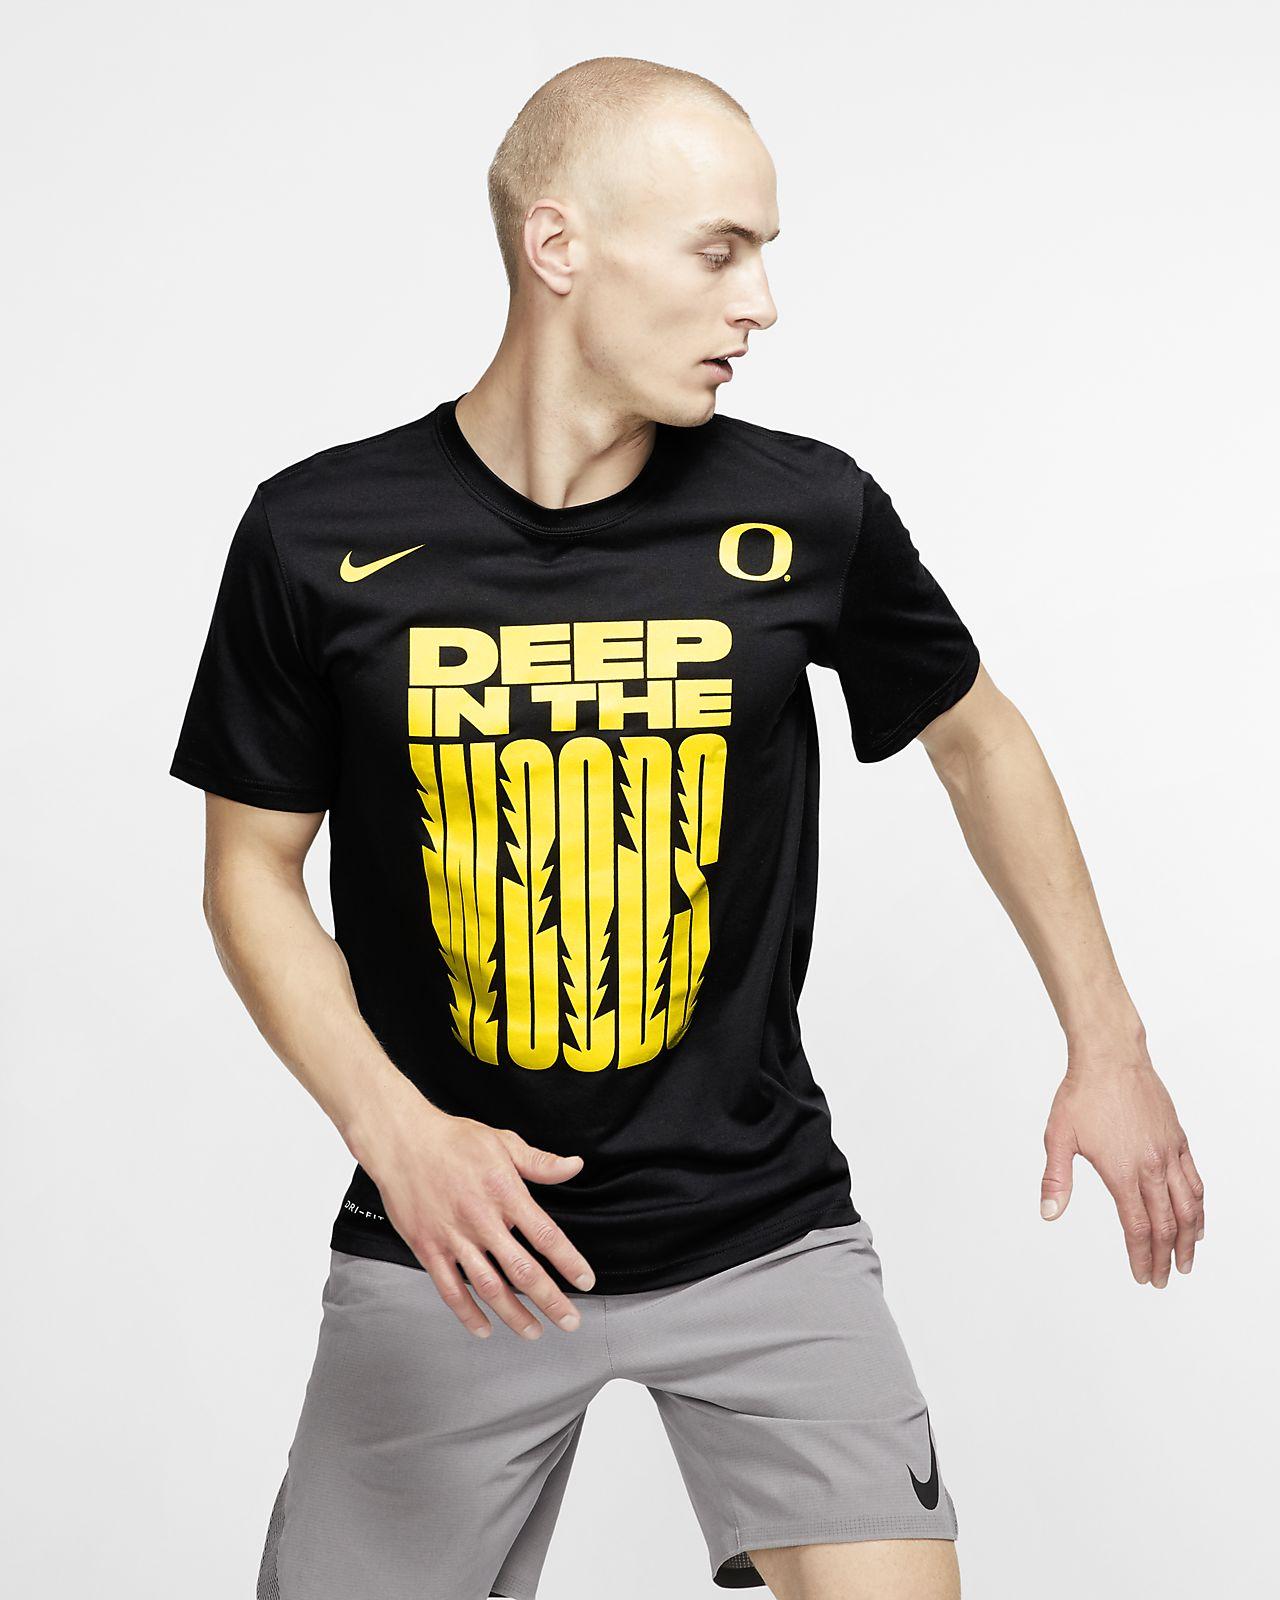 7816f6e5 Nike Mens Legend Dri Fit Short Sleeve Training T Shirt - DREAMWORKS